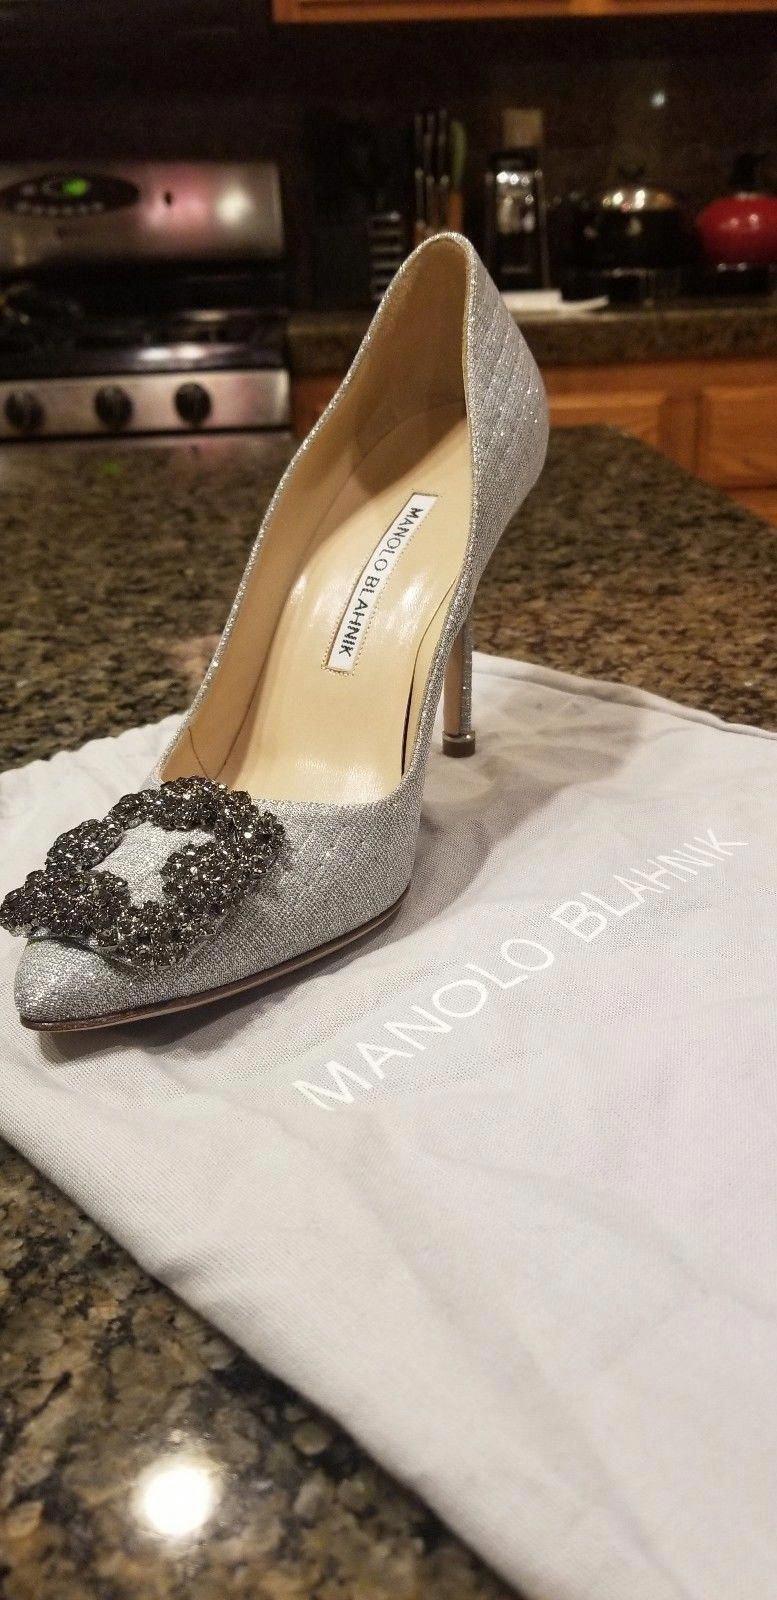 e92d115b0761b MANOLO BLAHNIK BRAND NEW 36.5 Hangisi Silver Notturno Women's Heels Bridal # ManoloBlahnik